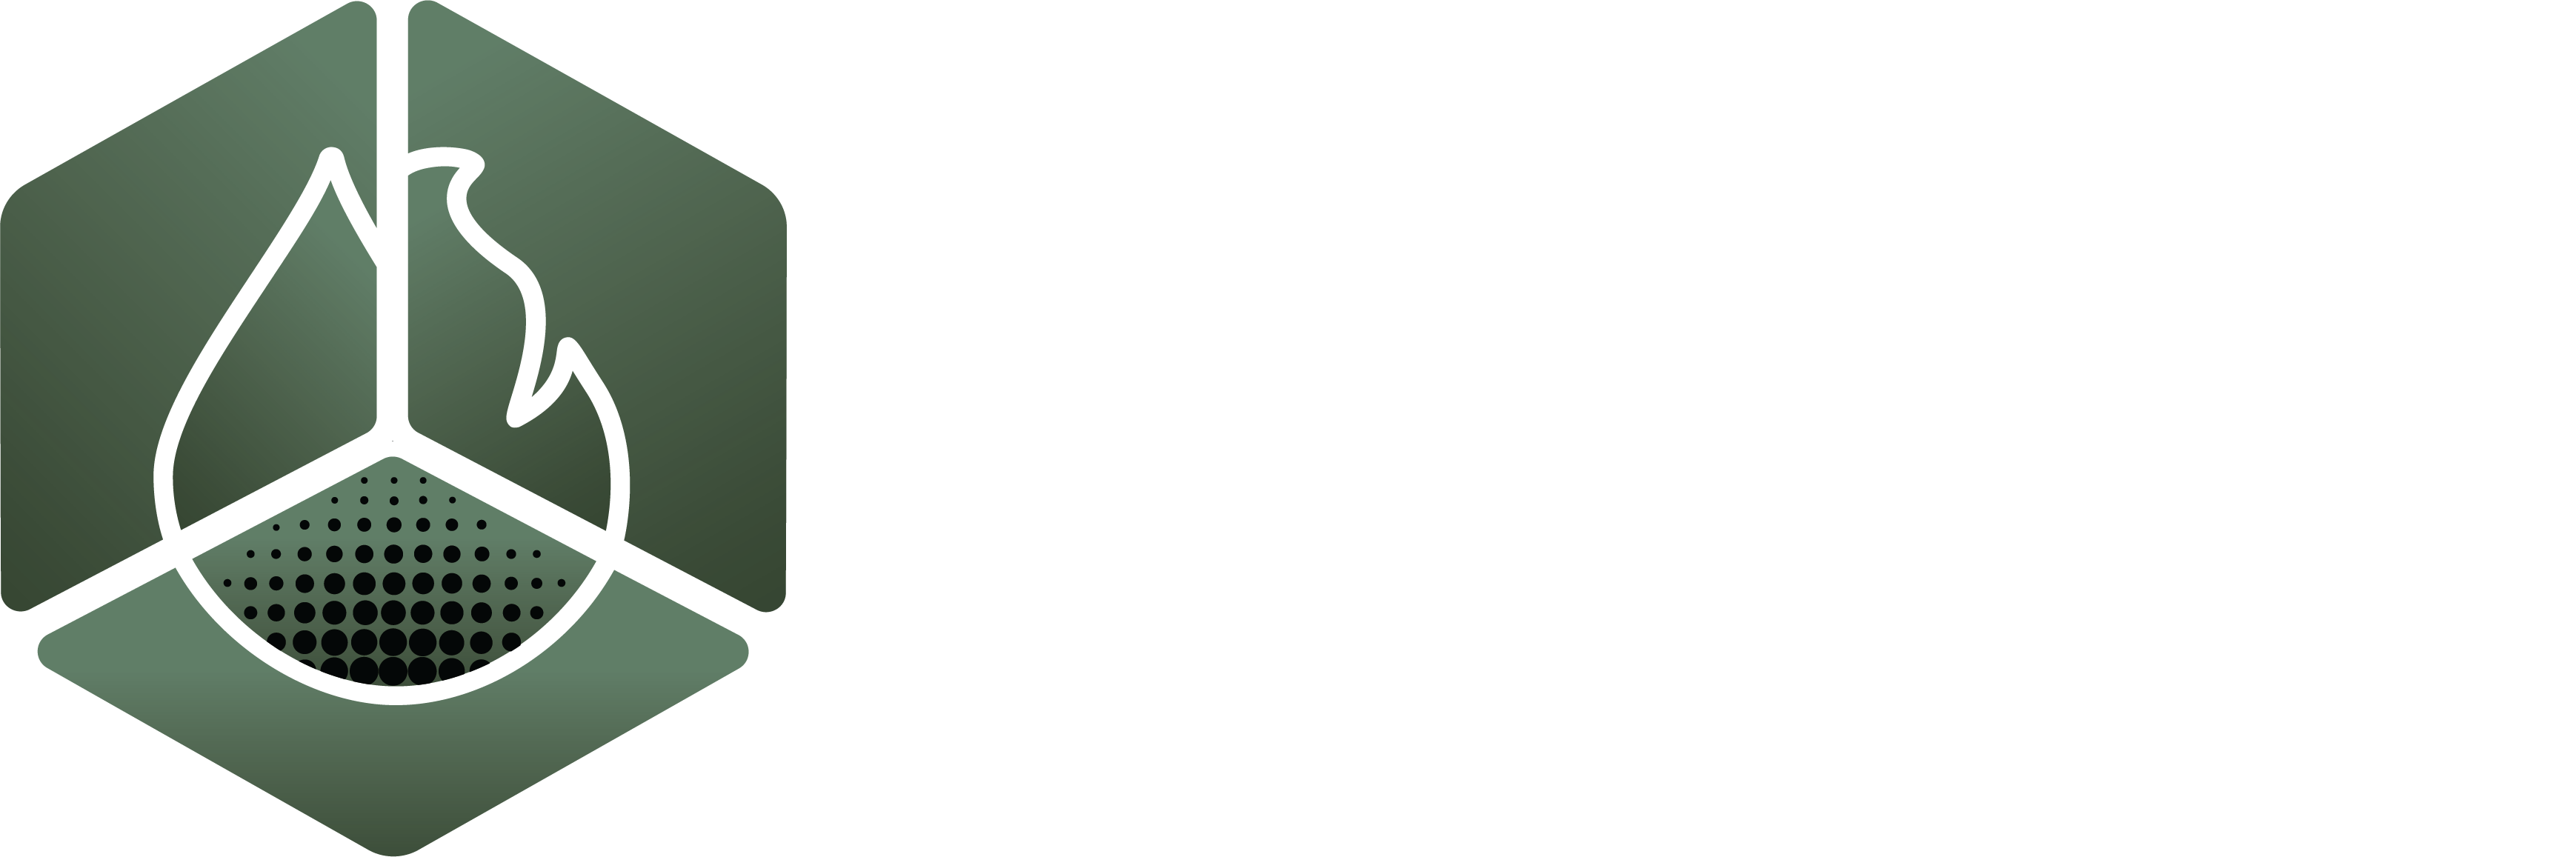 Mould / Biohazard Restoration